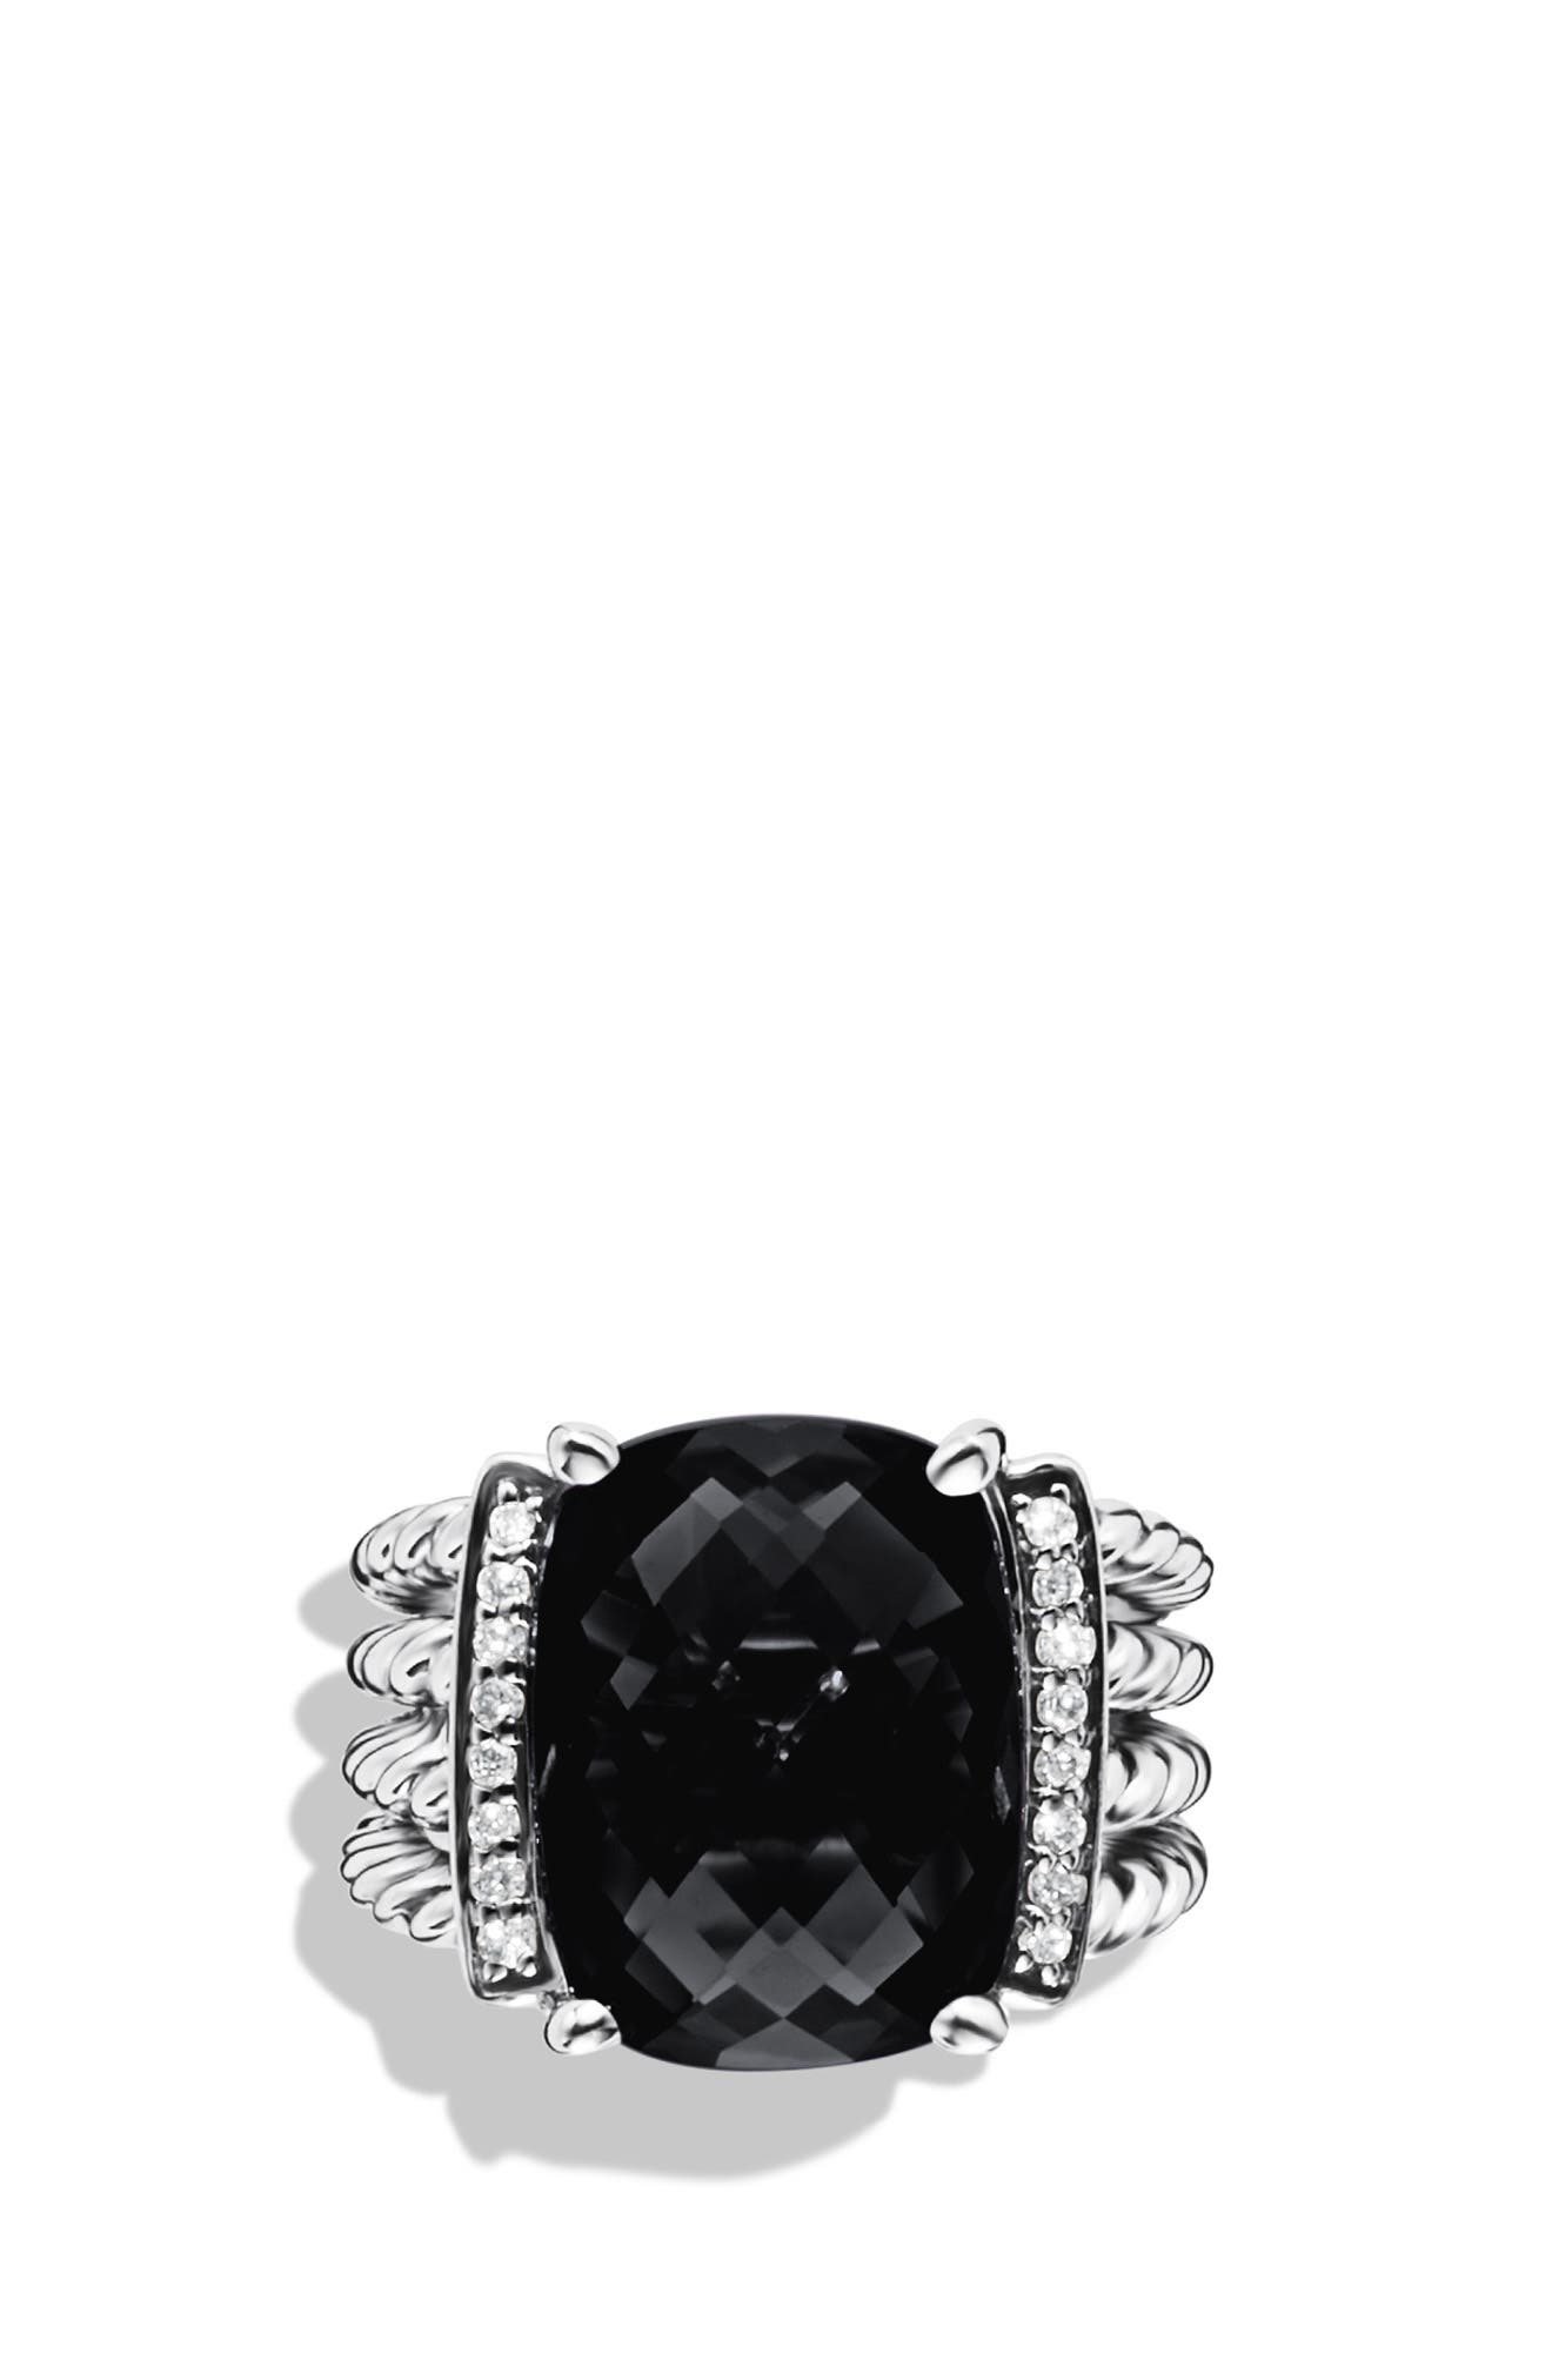 'Wheaton' Ring with Semiprecious Stone & Diamonds,                             Alternate thumbnail 2, color,                             BLACK ONYX